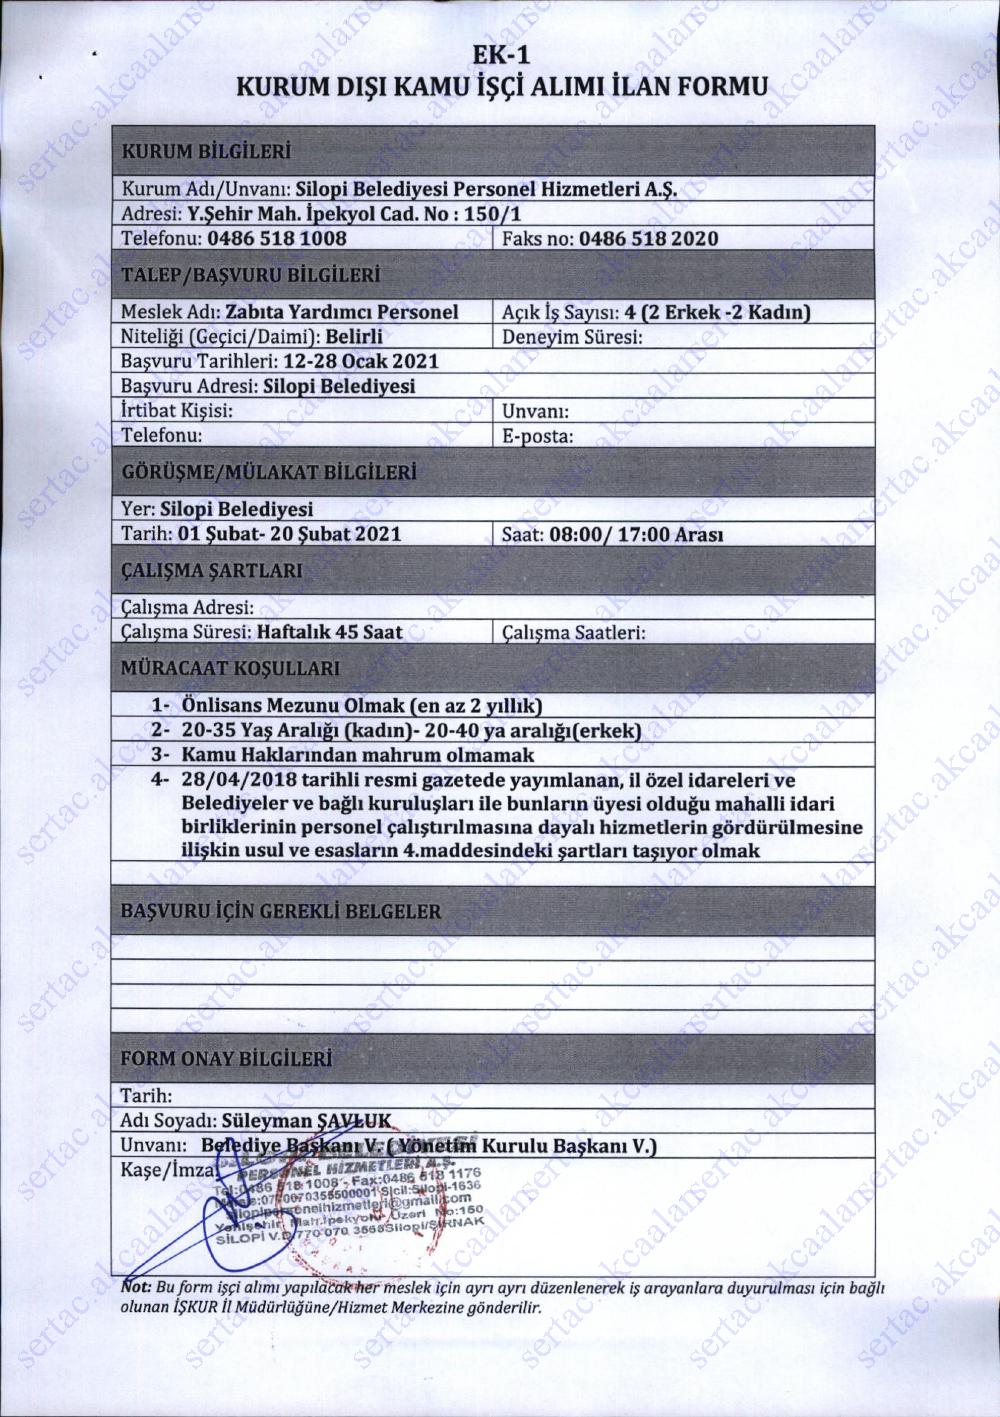 sirnak-silopi-beld-pers-hiz-a-s-28-01-2021-000001.png